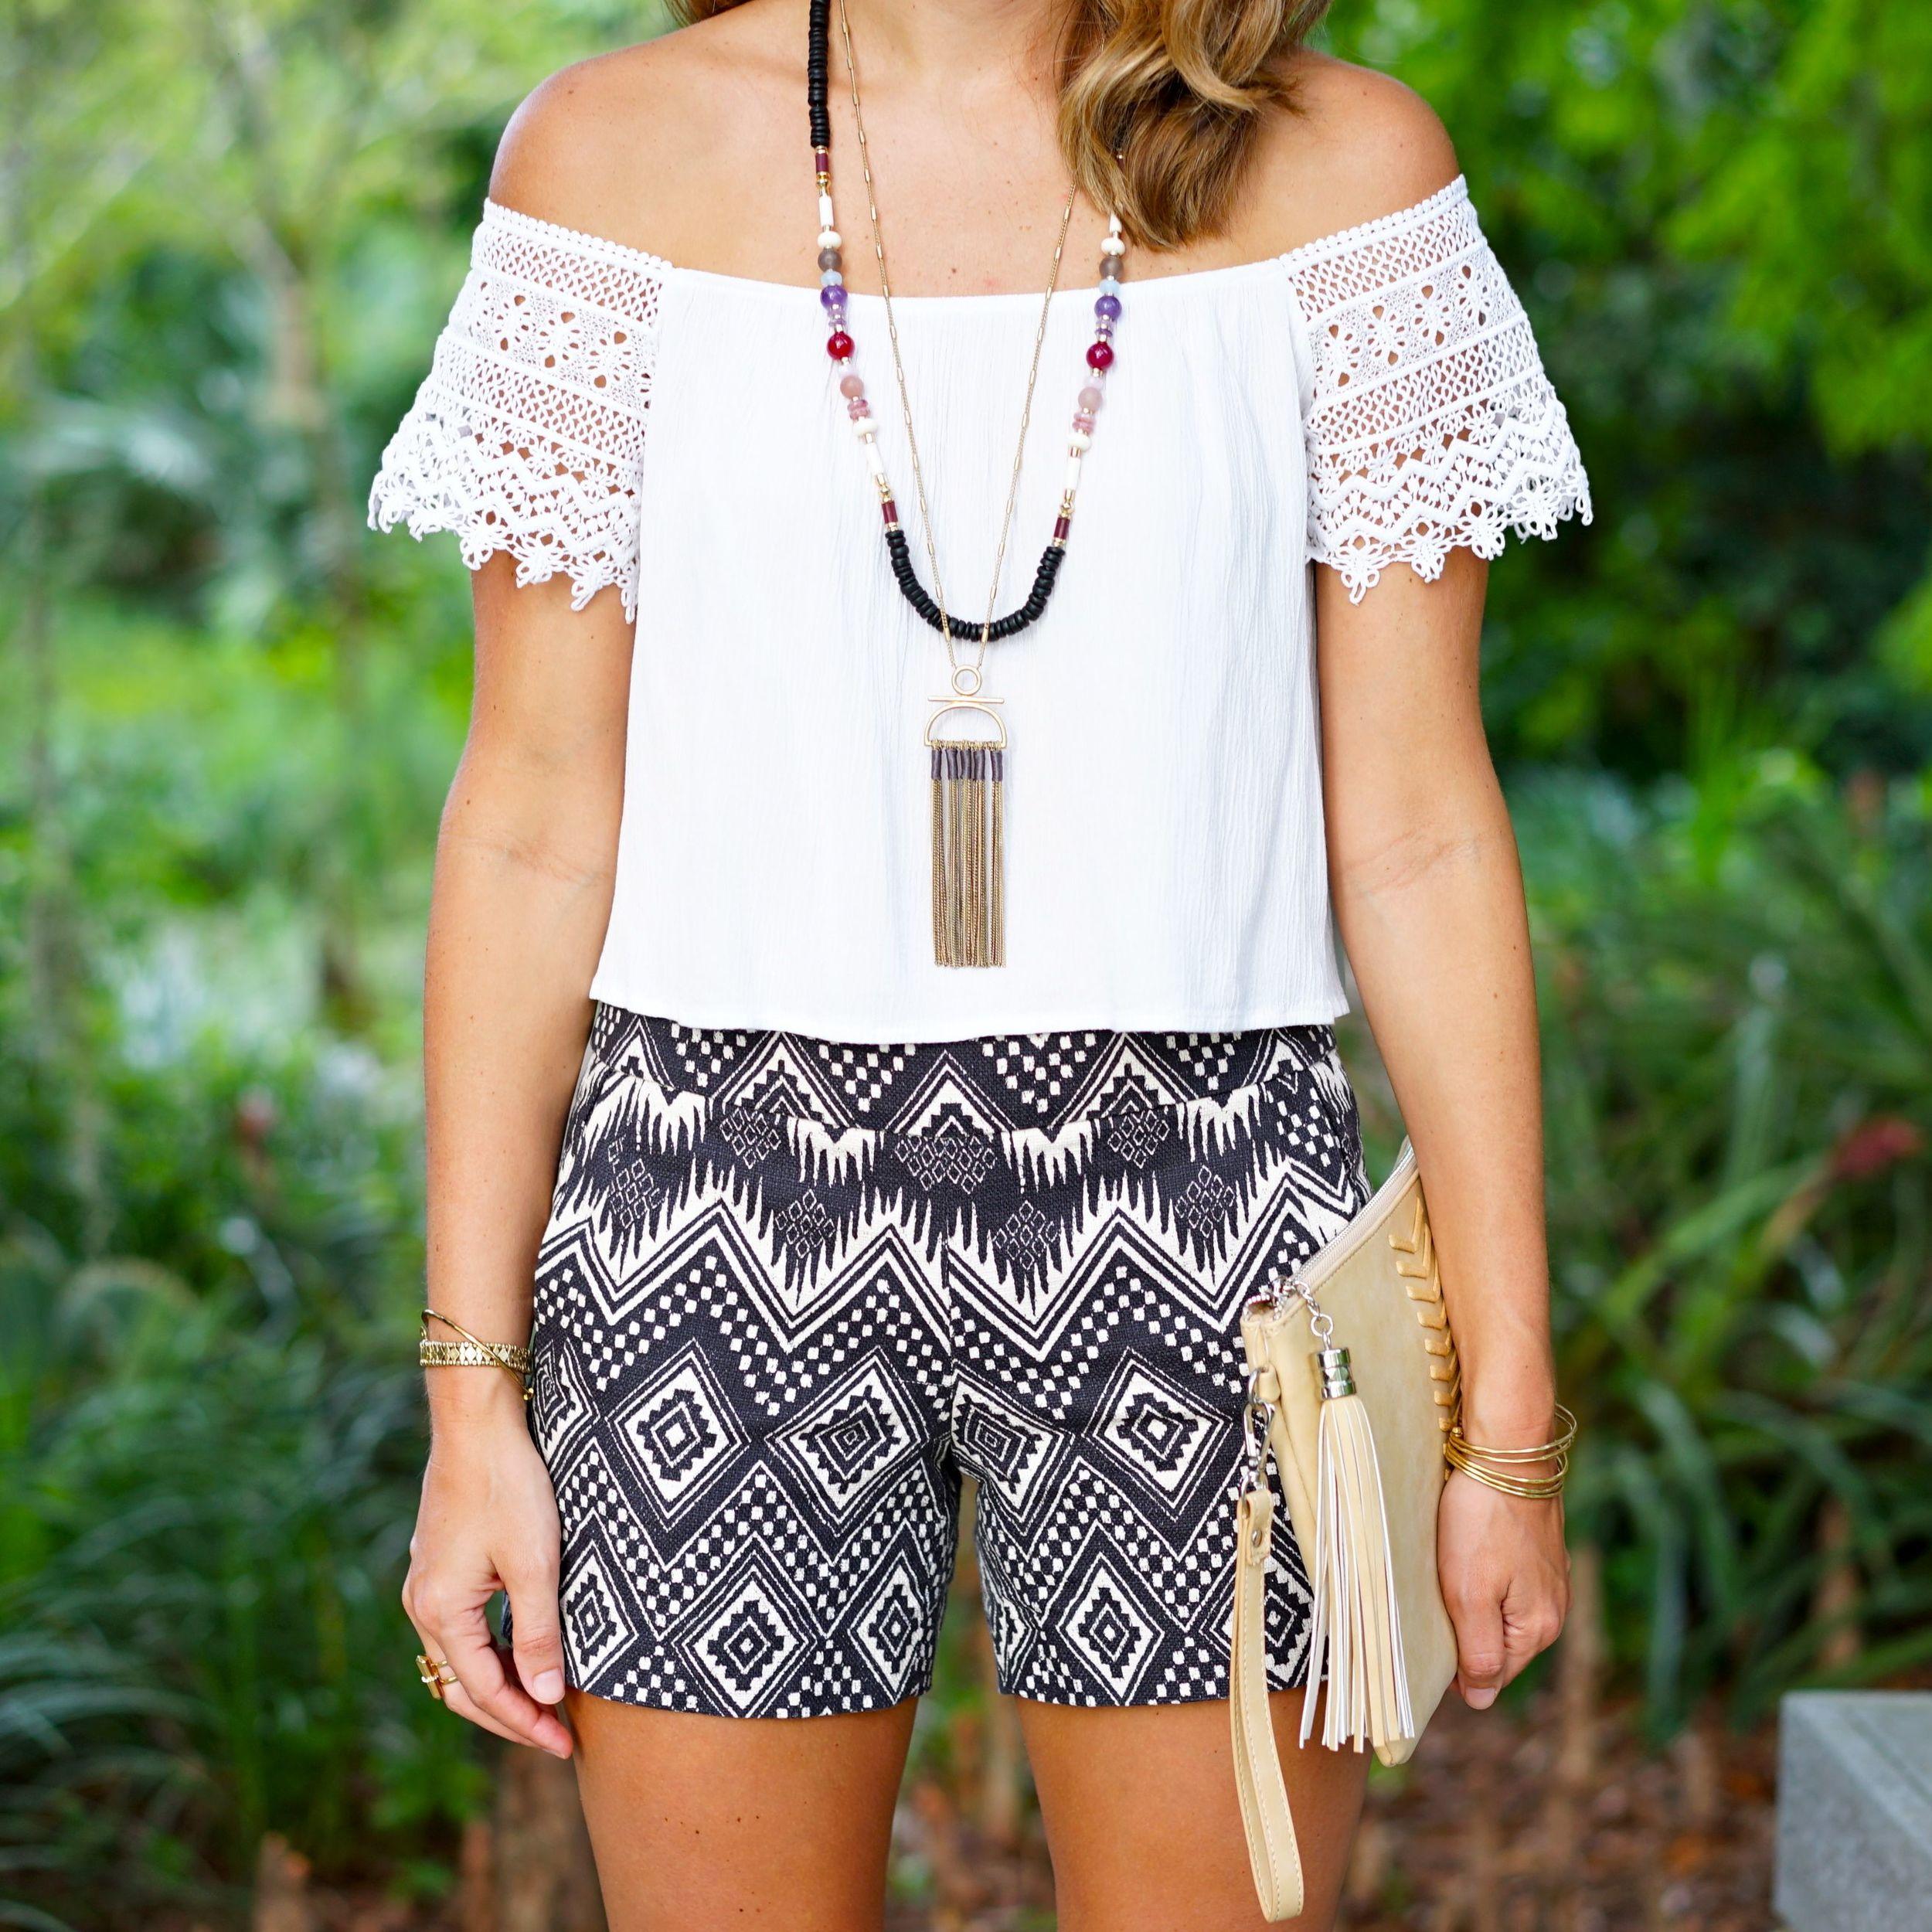 White off shoulder top, navy tribal shorts